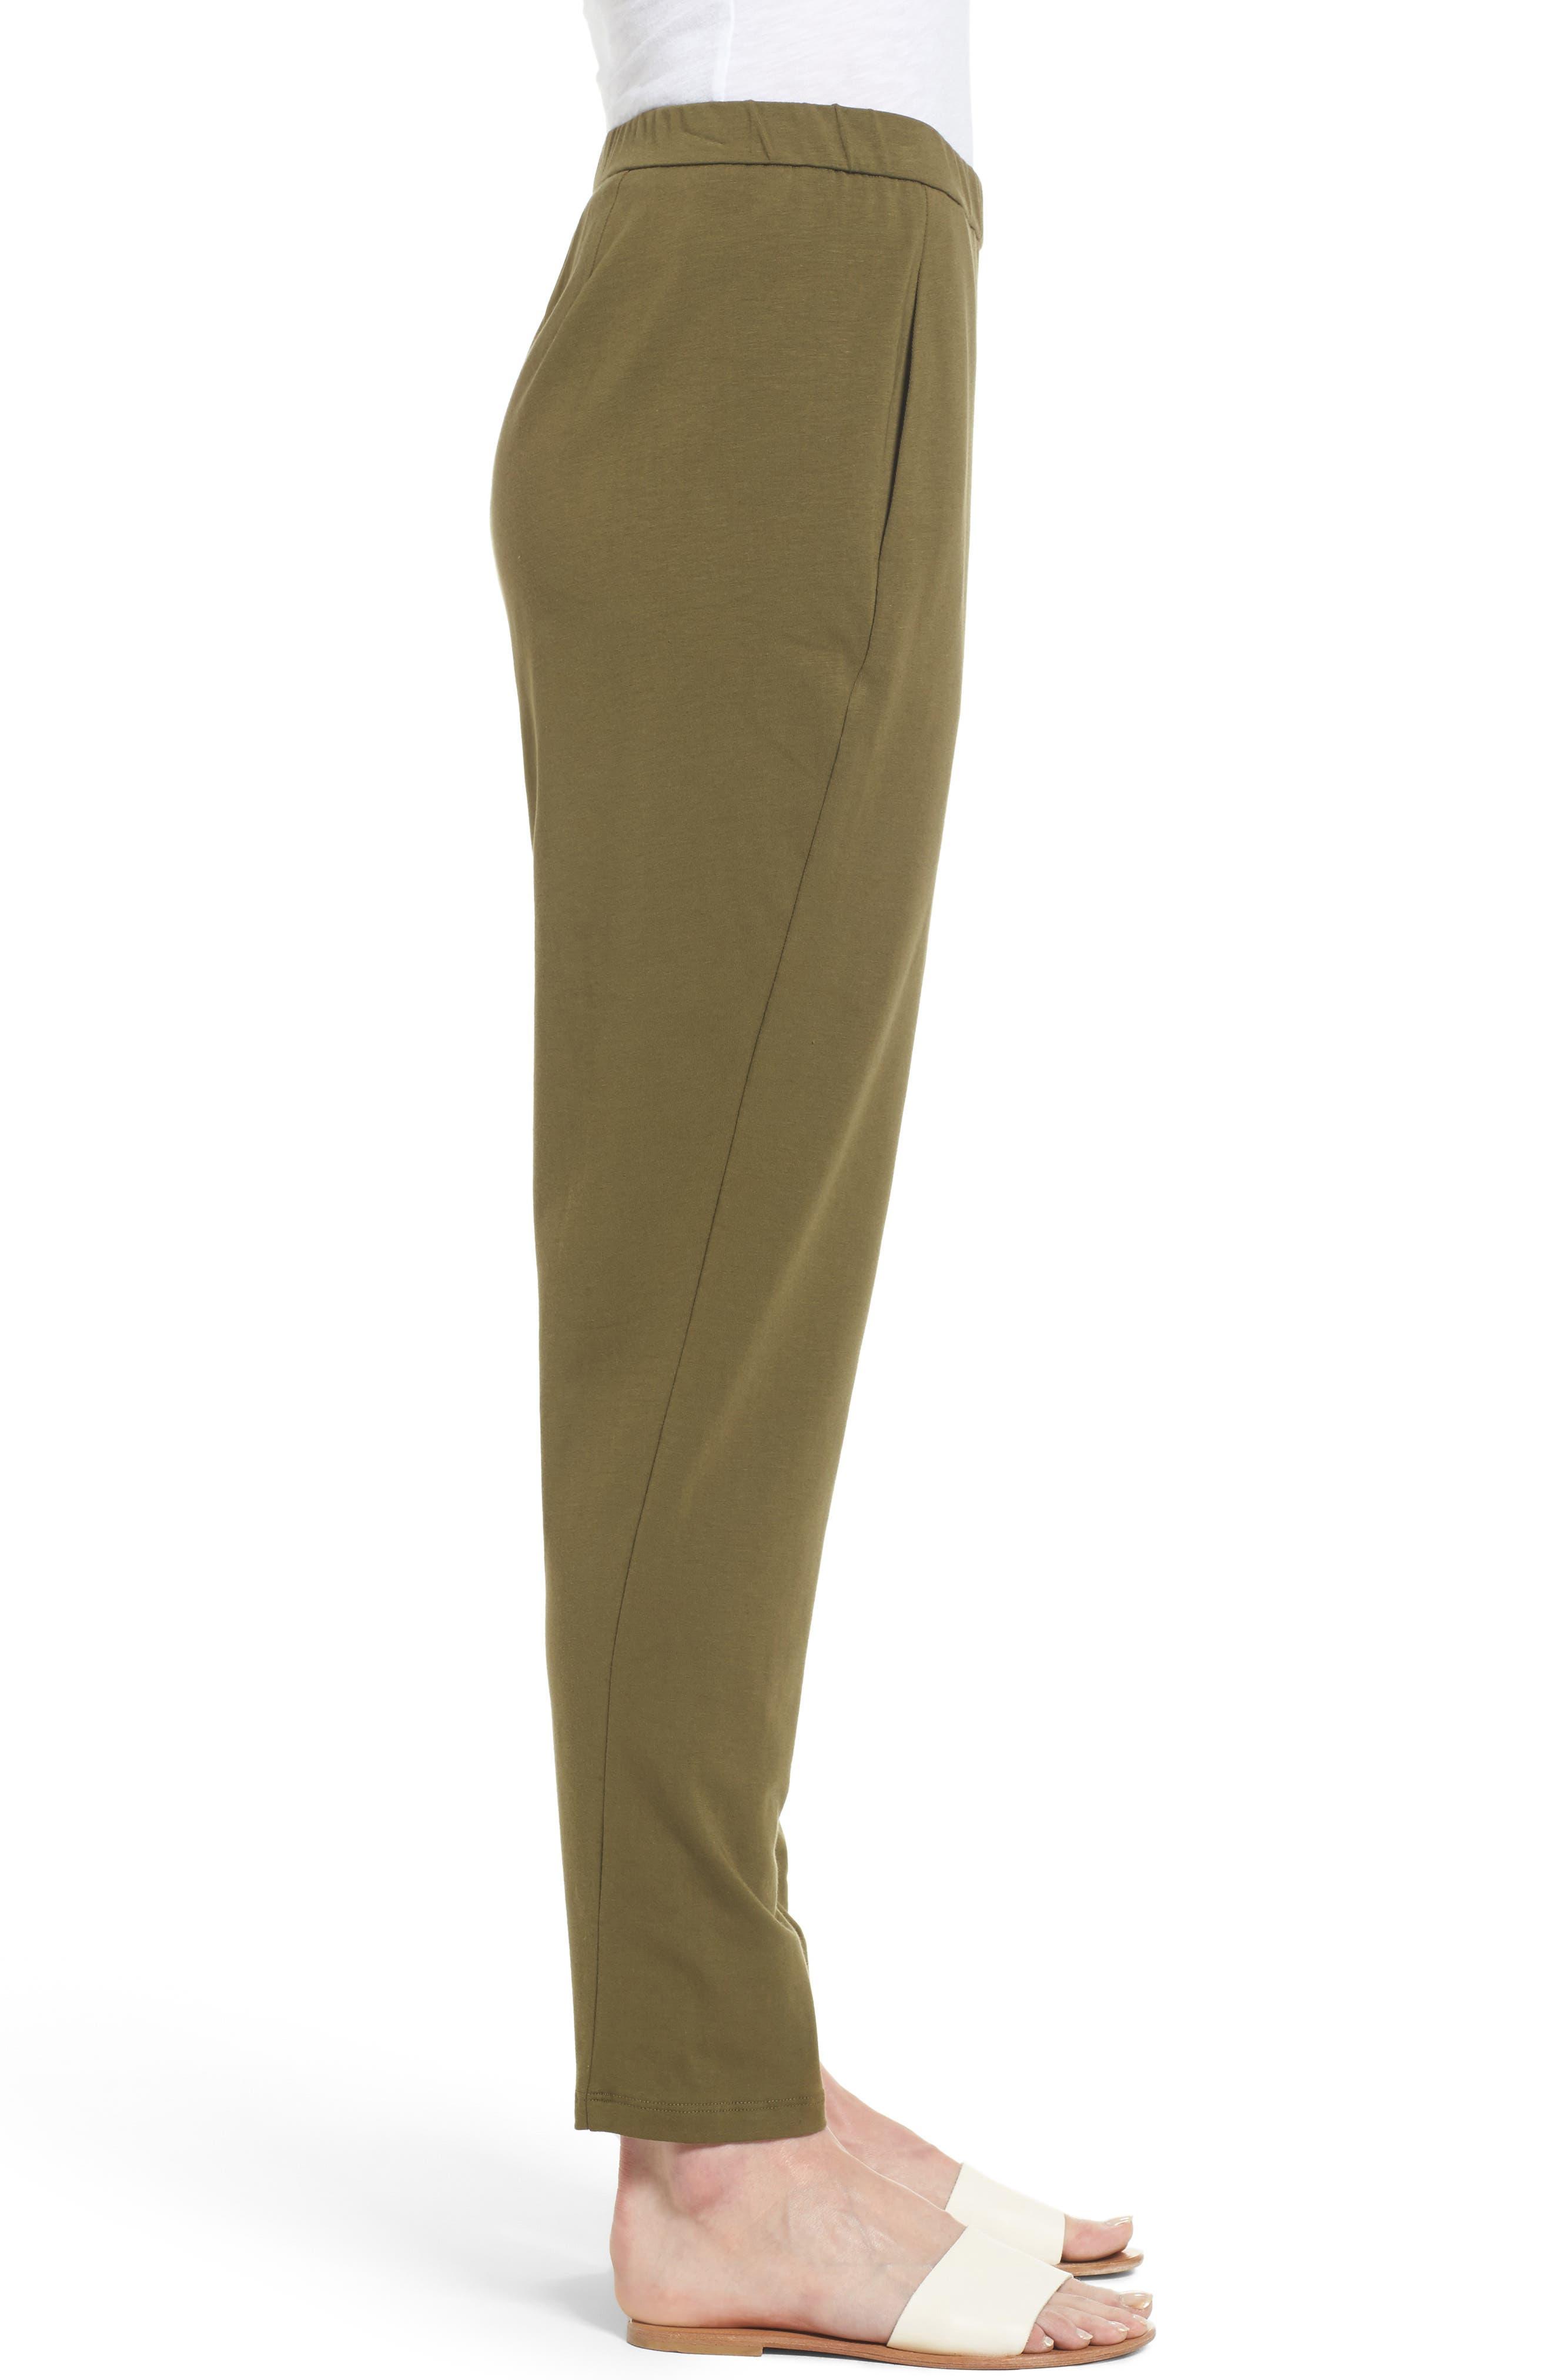 Alternate Image 3  - Eileen Fisher Stretch Organic Cotton Slim Slouchy Ankle Pants (Regular & Petite)